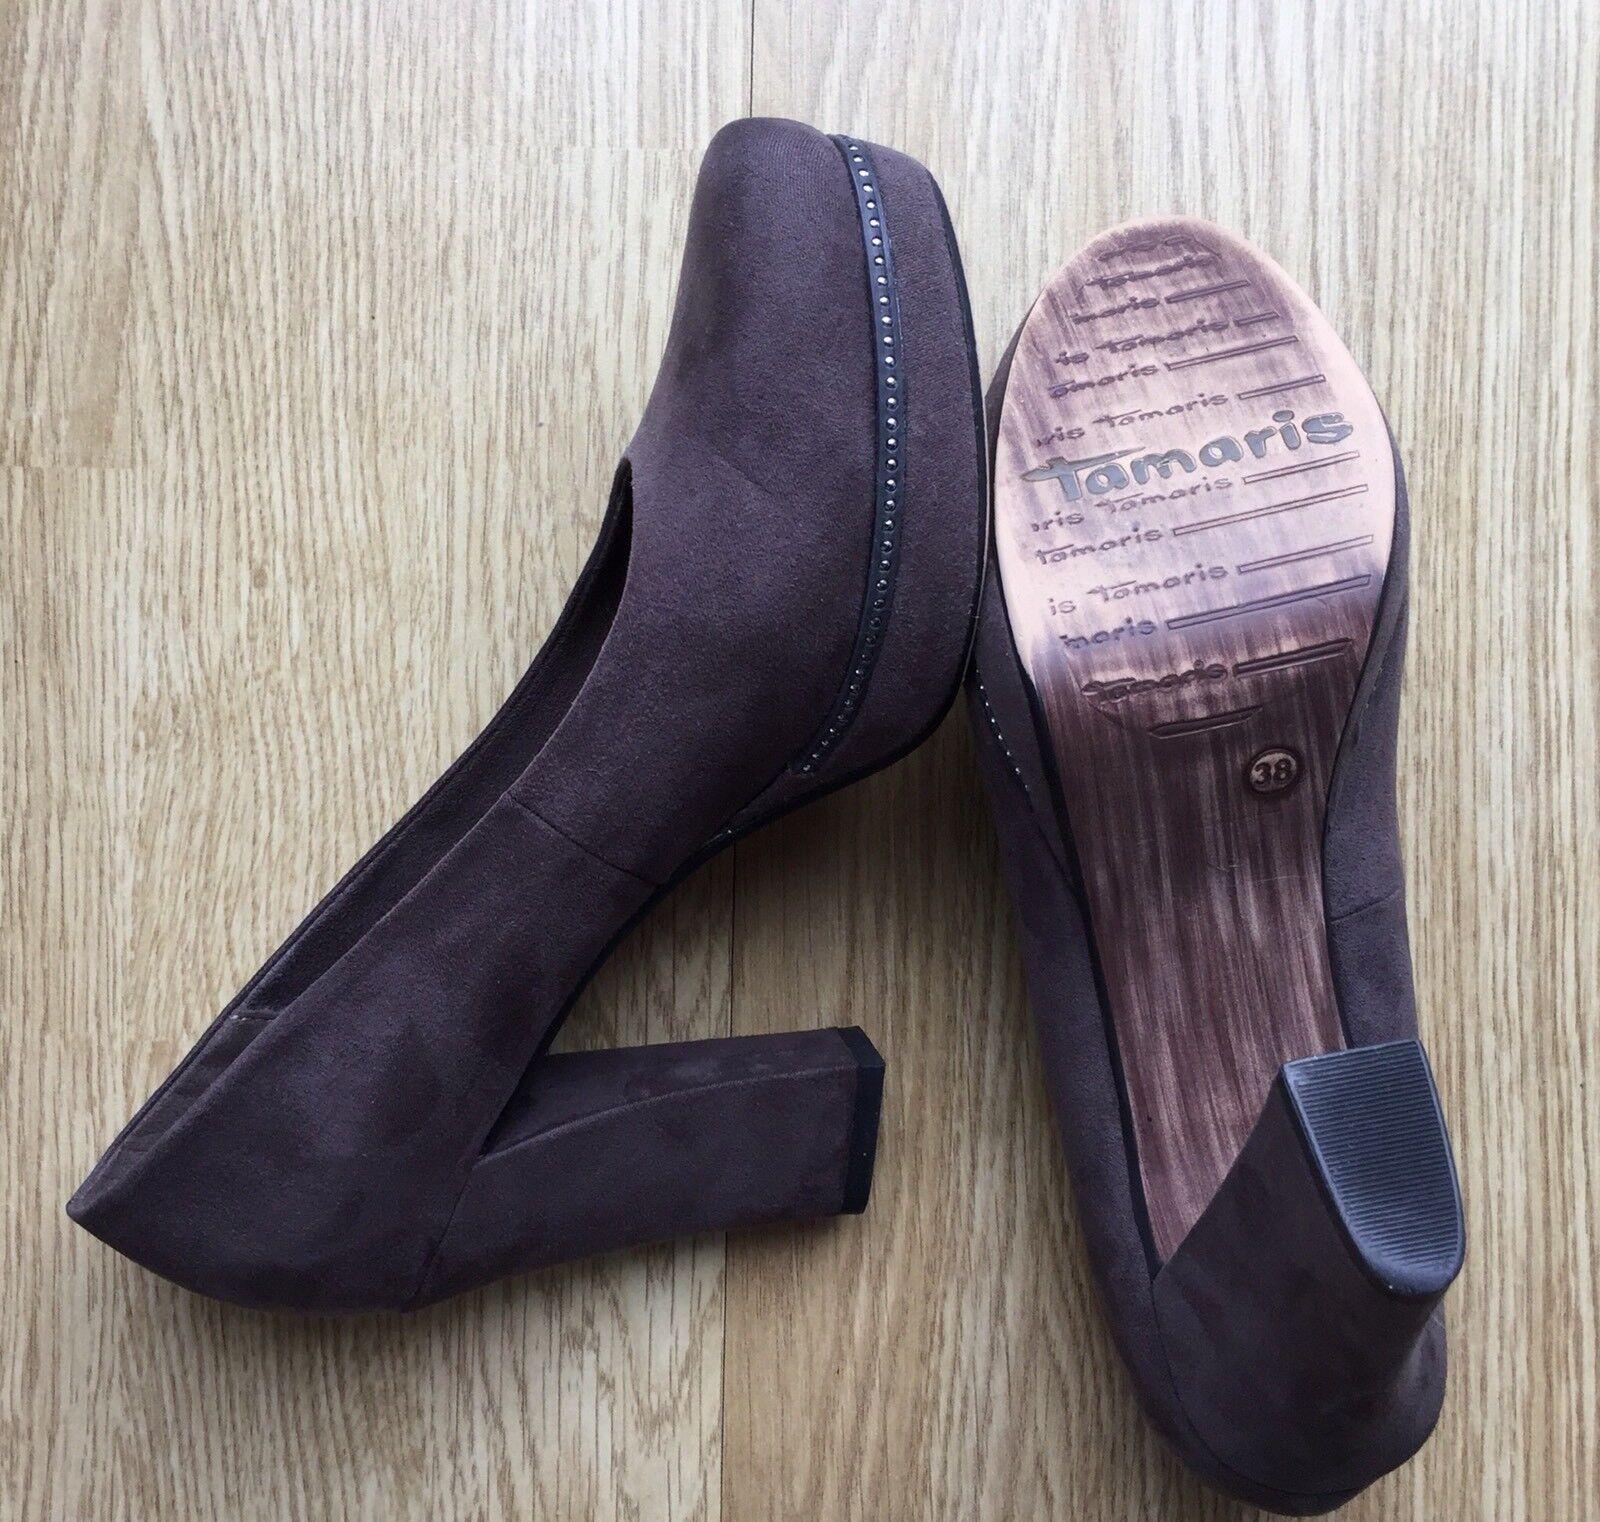 Tamaris Gr. Damen Pumps Schuhe - grau anthrazit - Gr. Tamaris 38 - WIE NEU ddbb1c